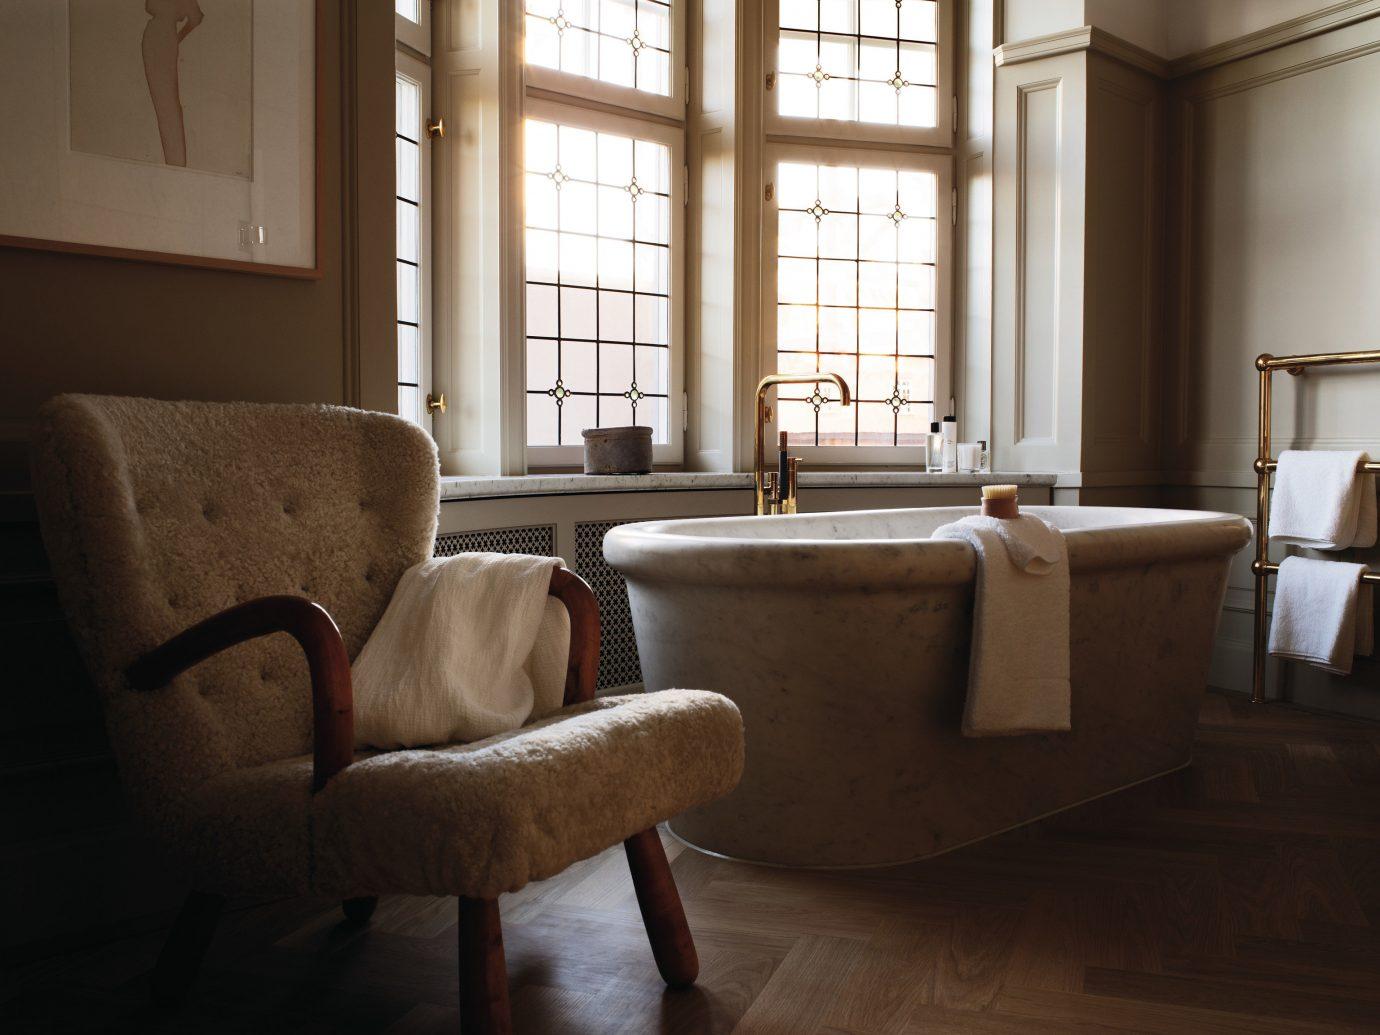 Design Hotels Stockholm Sweden window floor indoor room furniture interior design table home flooring wood chair living room house tub tan